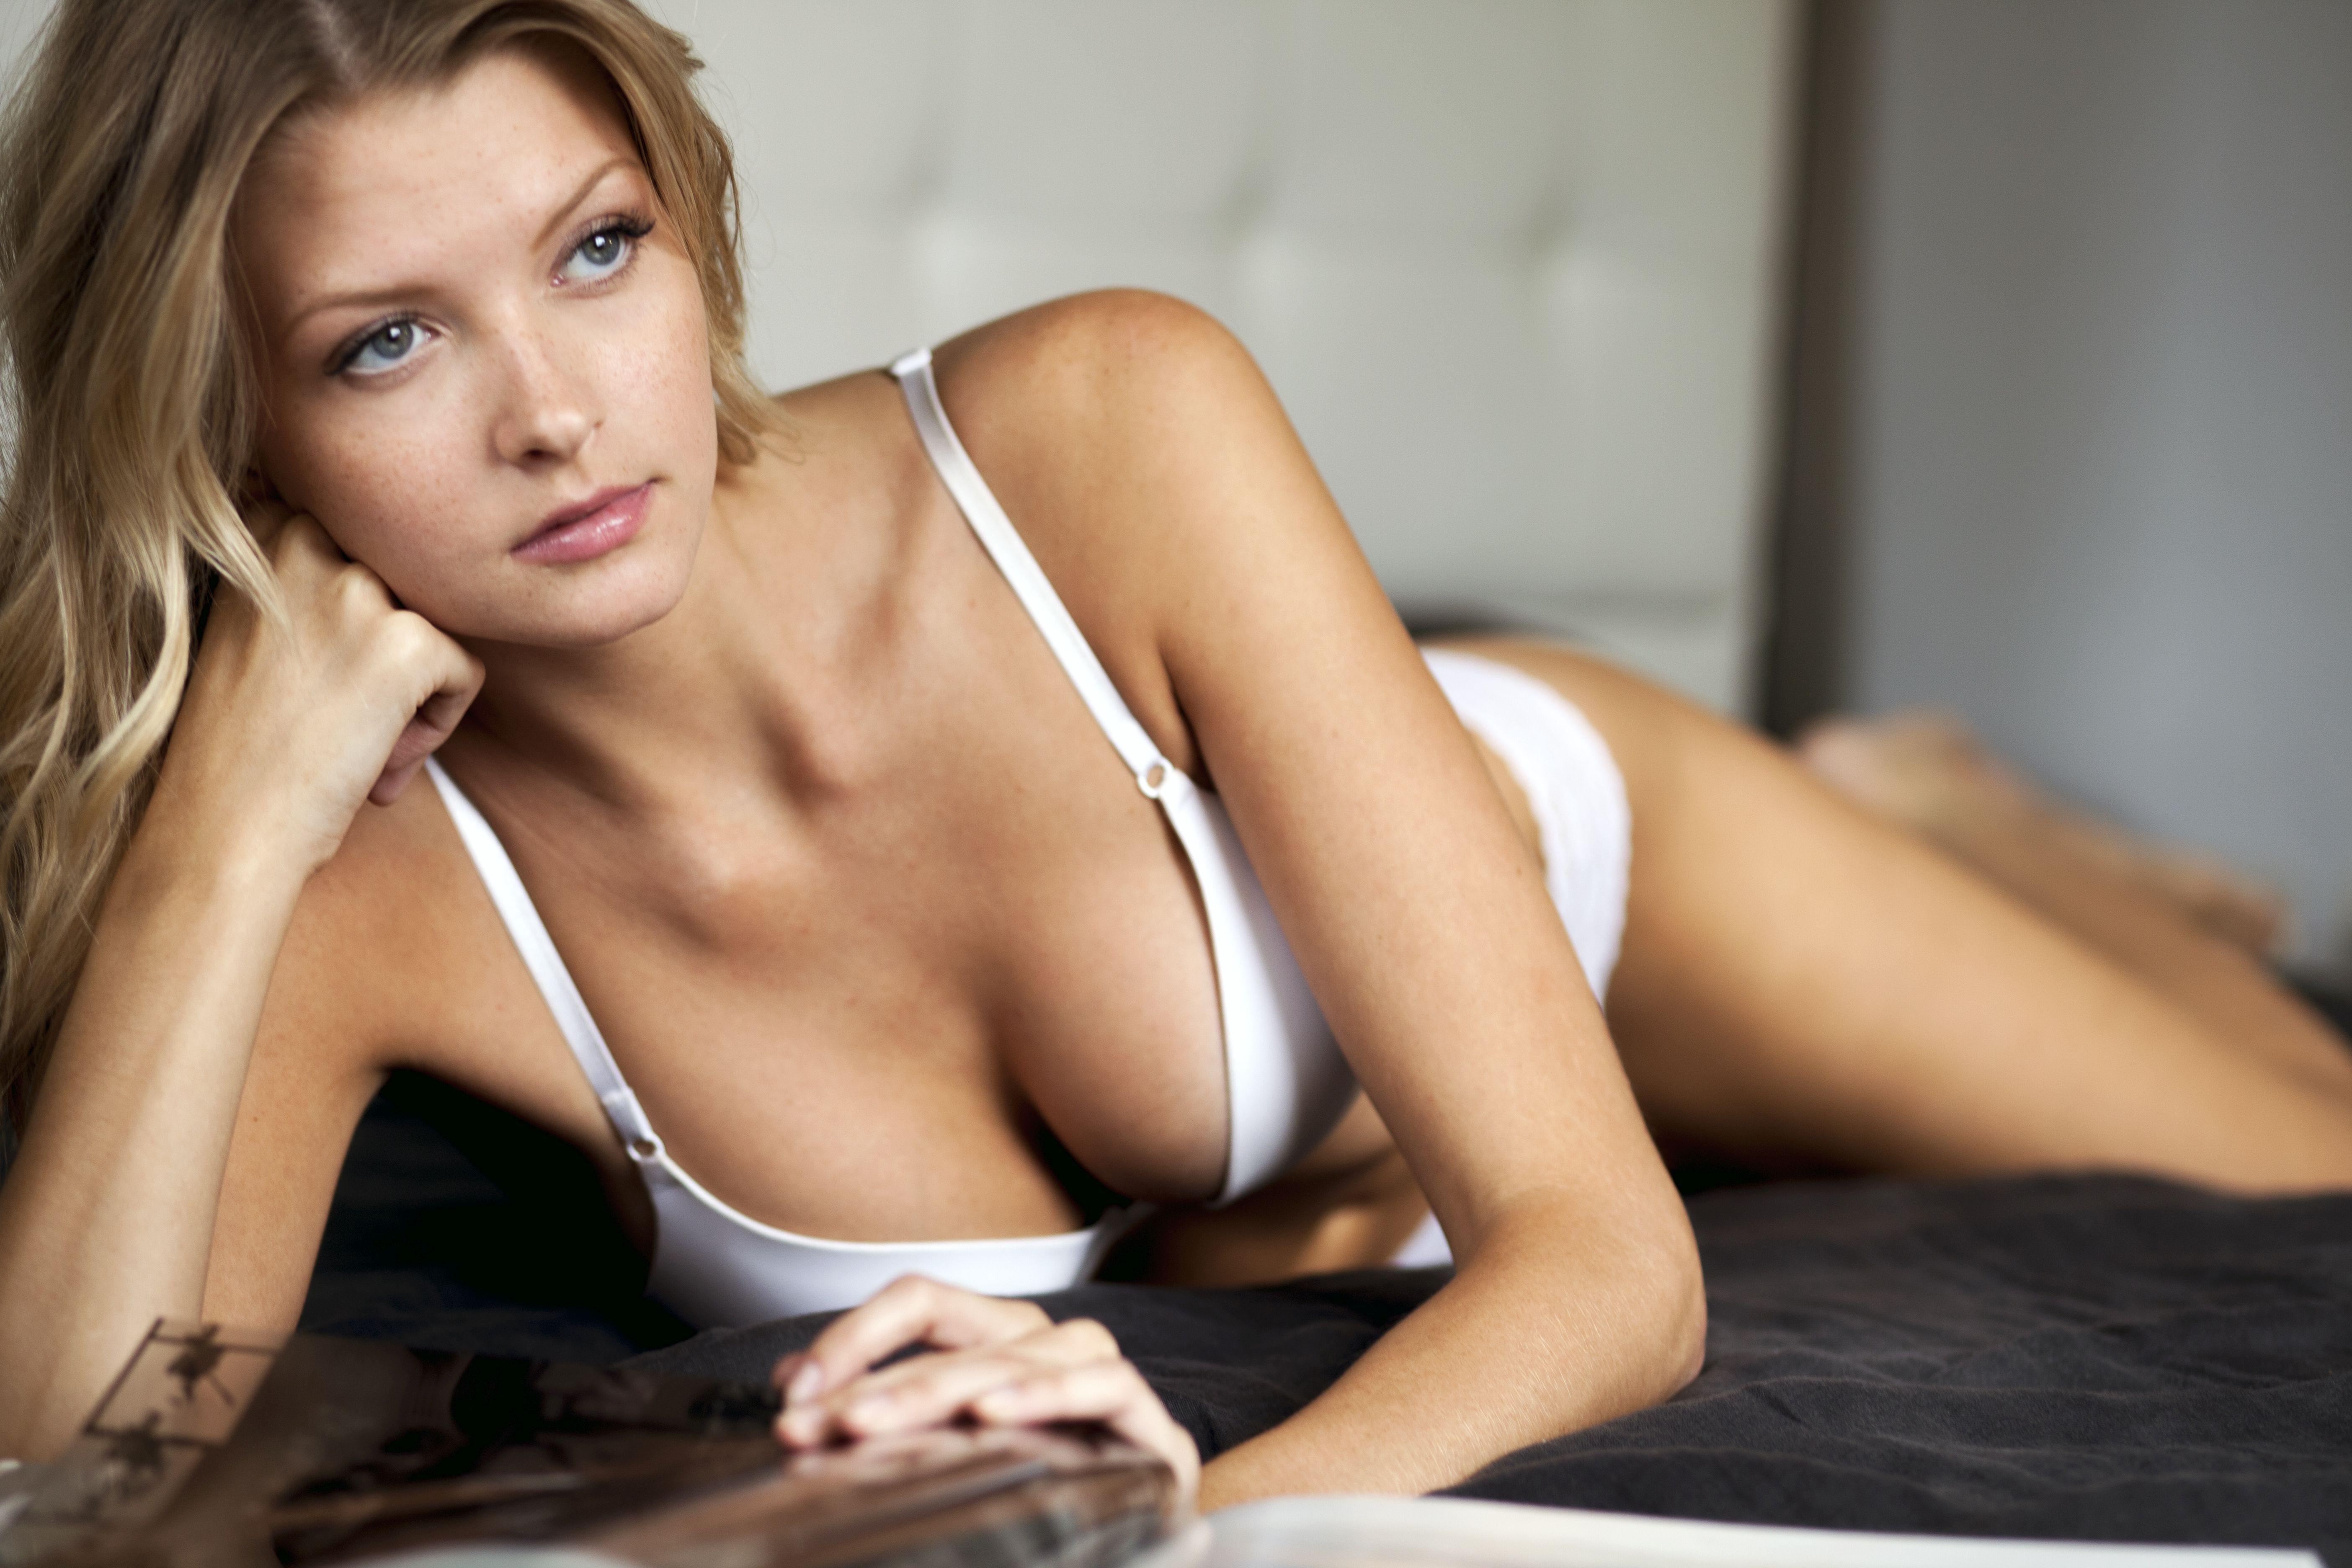 Erotic art photos of naked women